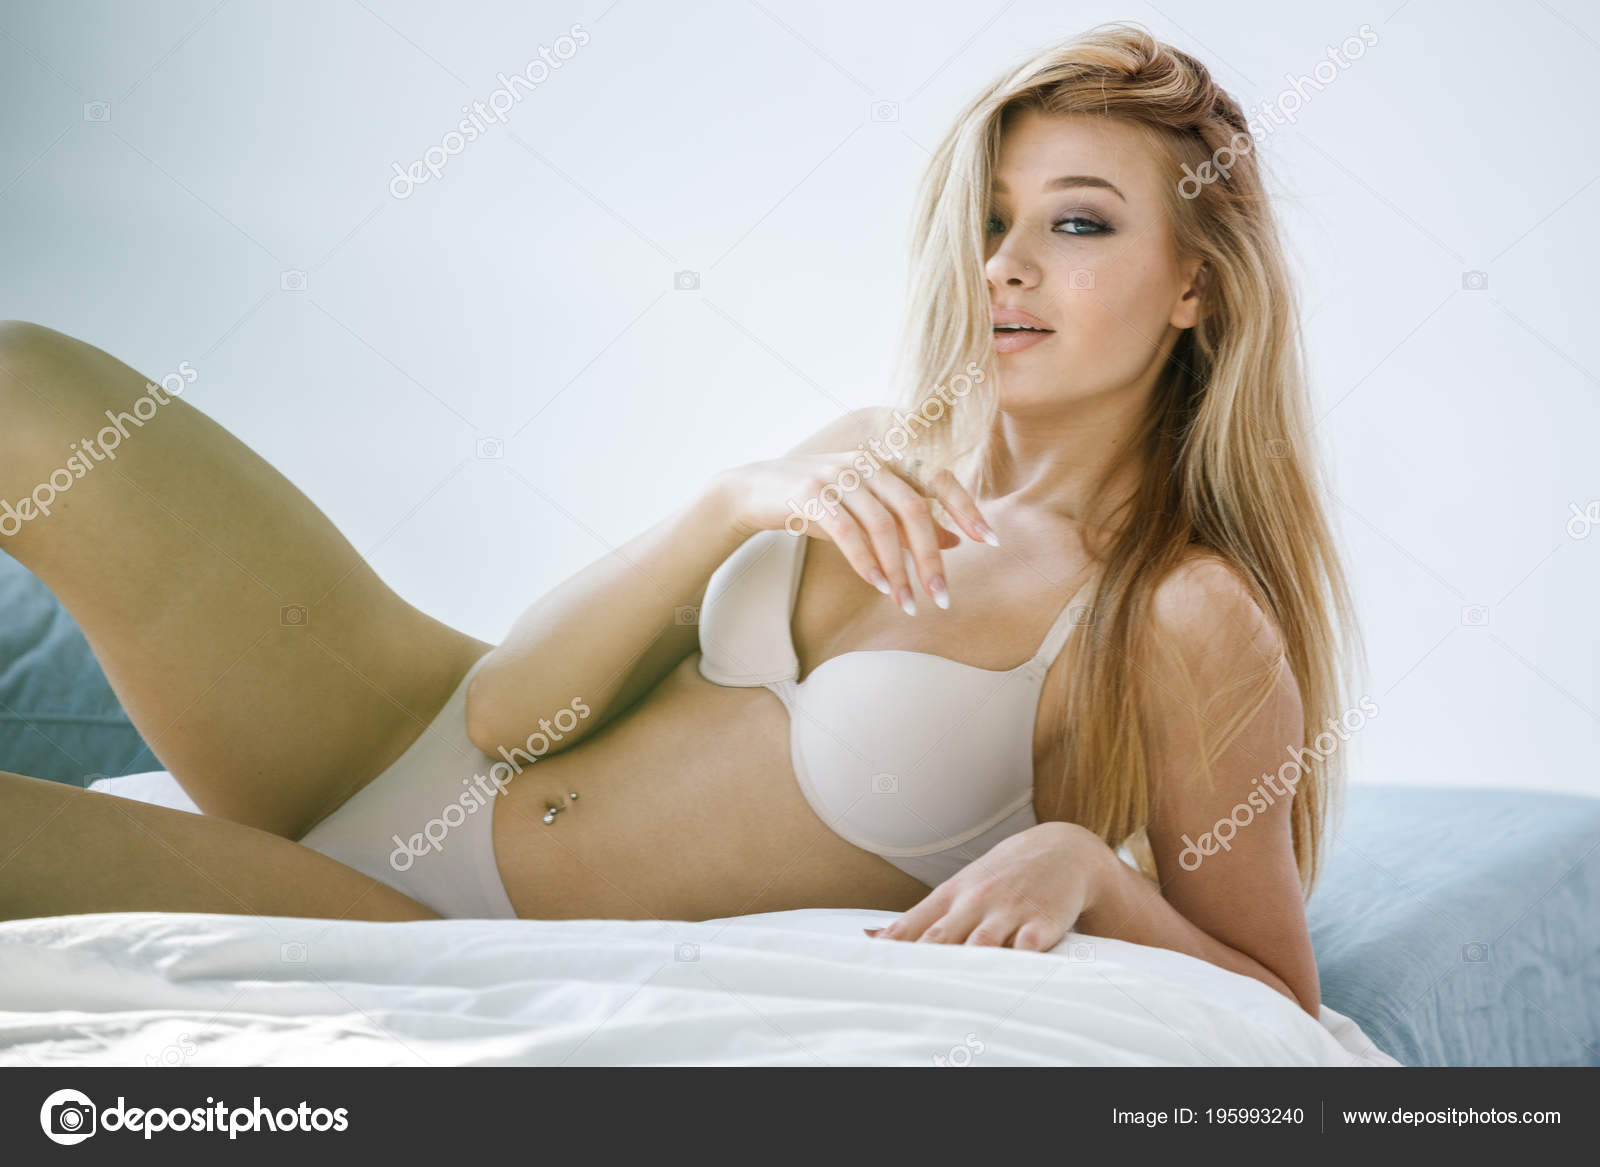 sexy Foto camaStock de rubia encantadora lencería estudio chica beige acostada mv80NnywO